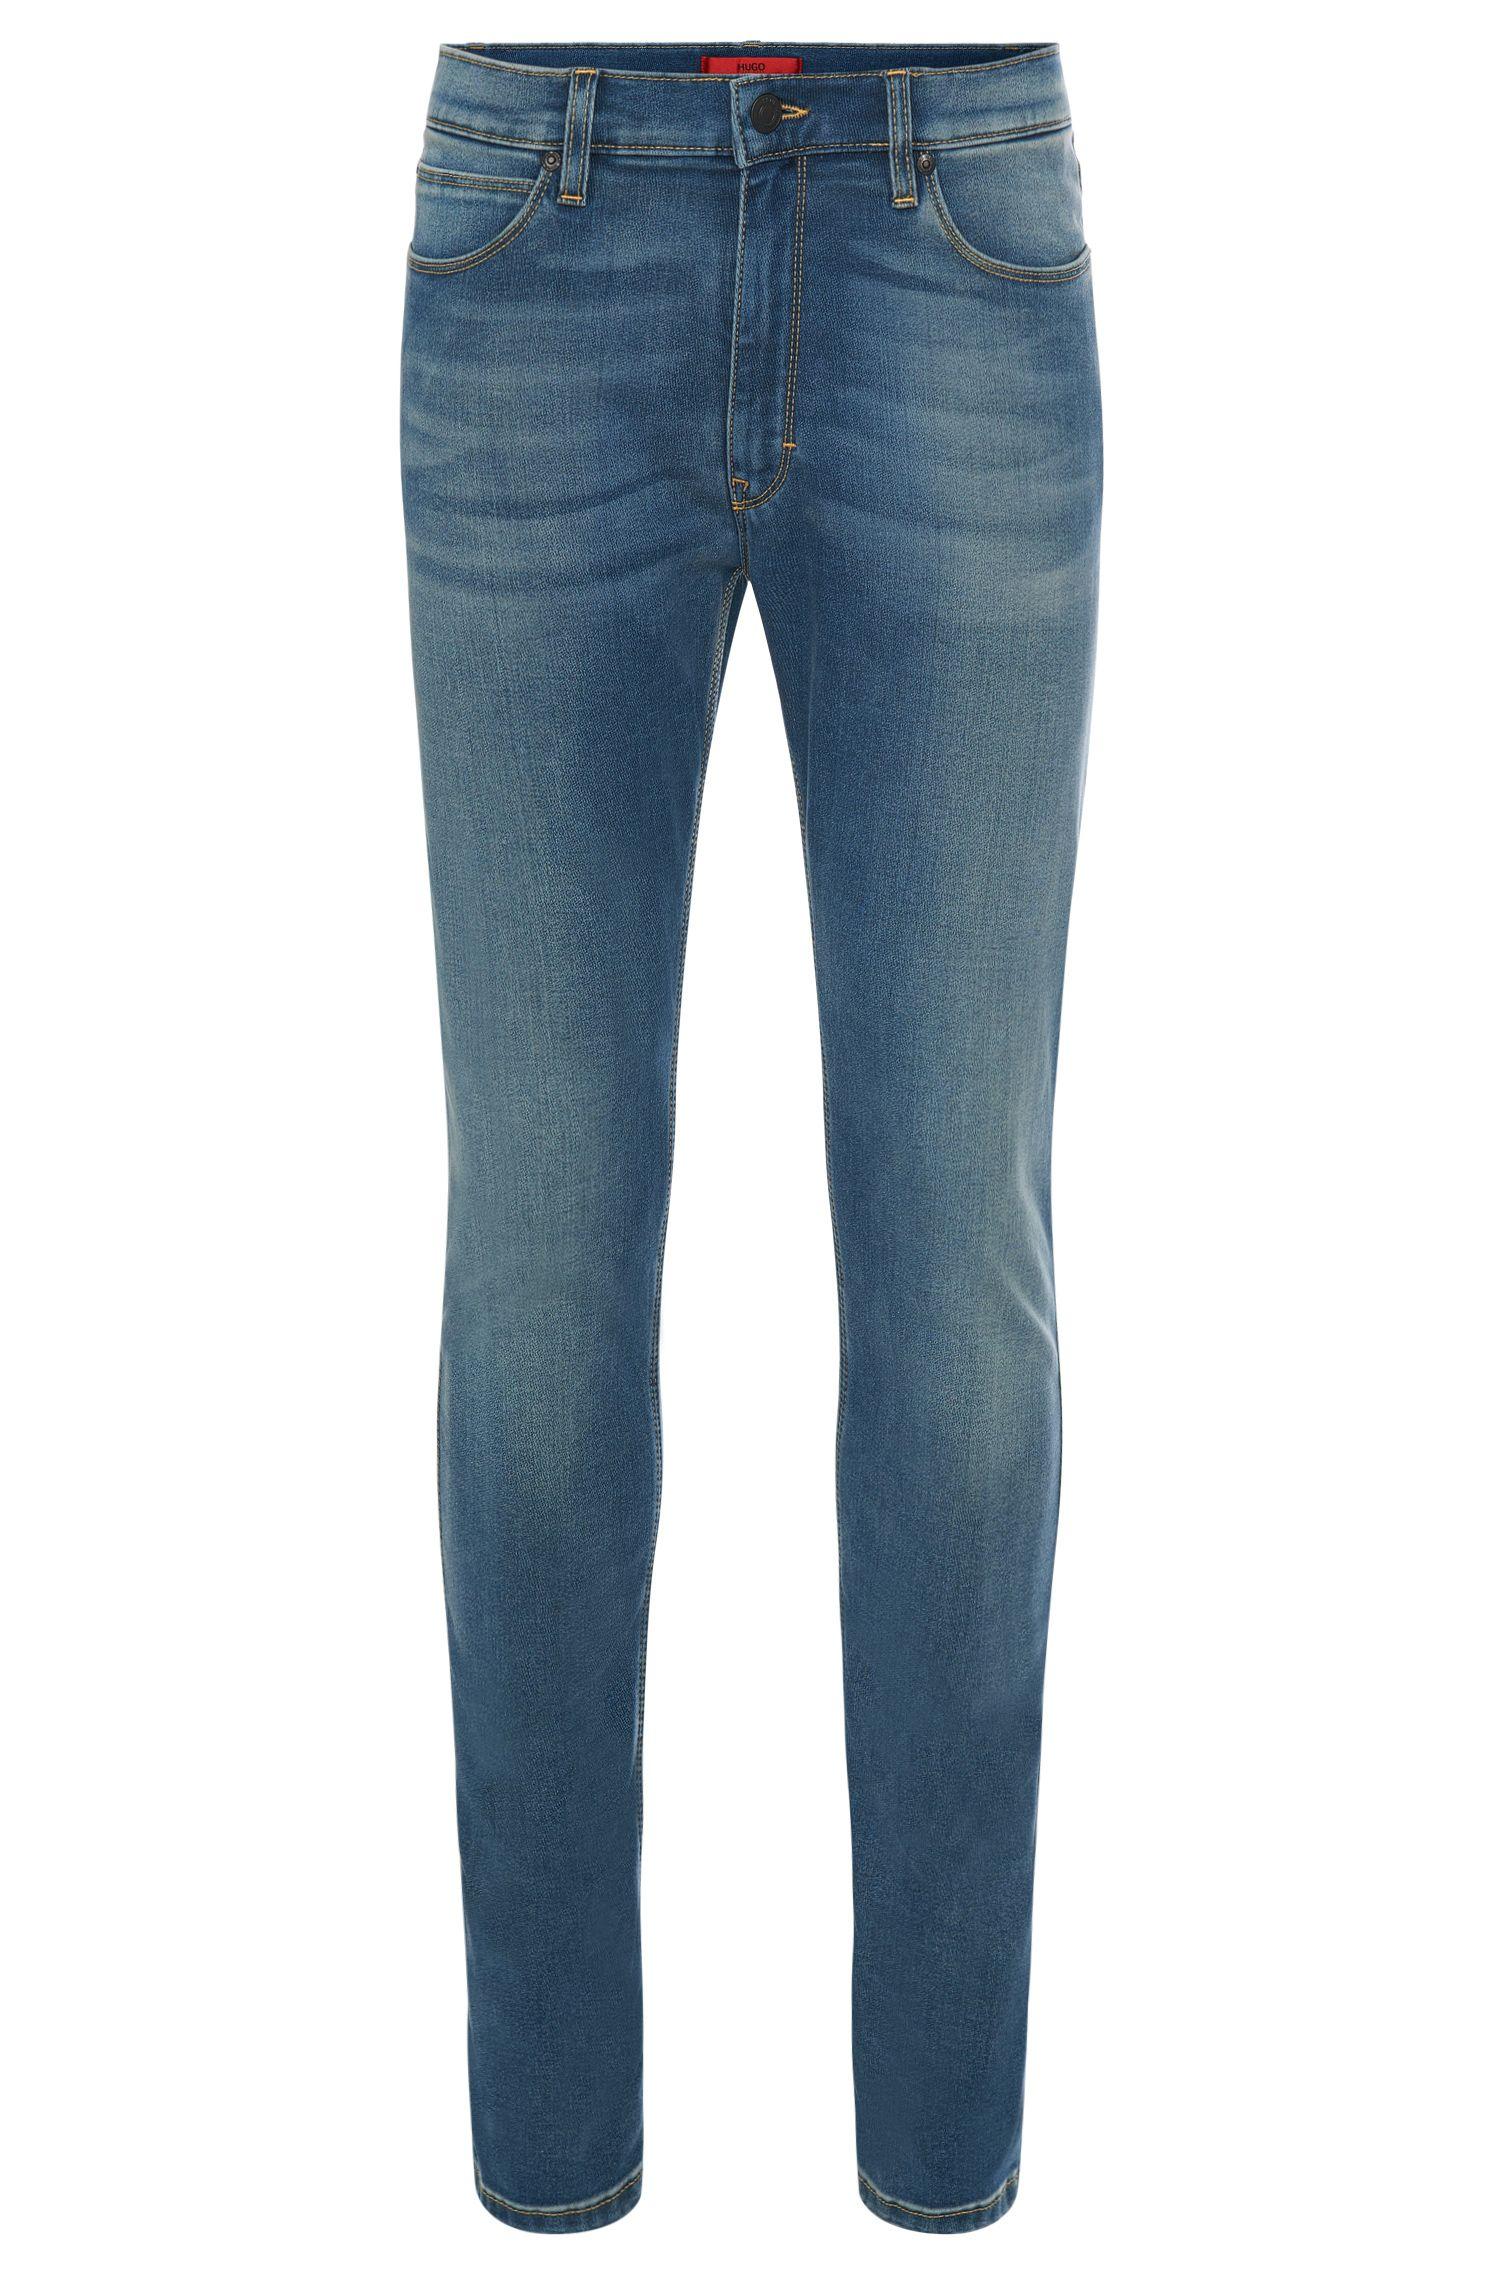 11.75 oz Stretch Cotton Blend Jeans, Skinny FIt   Hugo 734